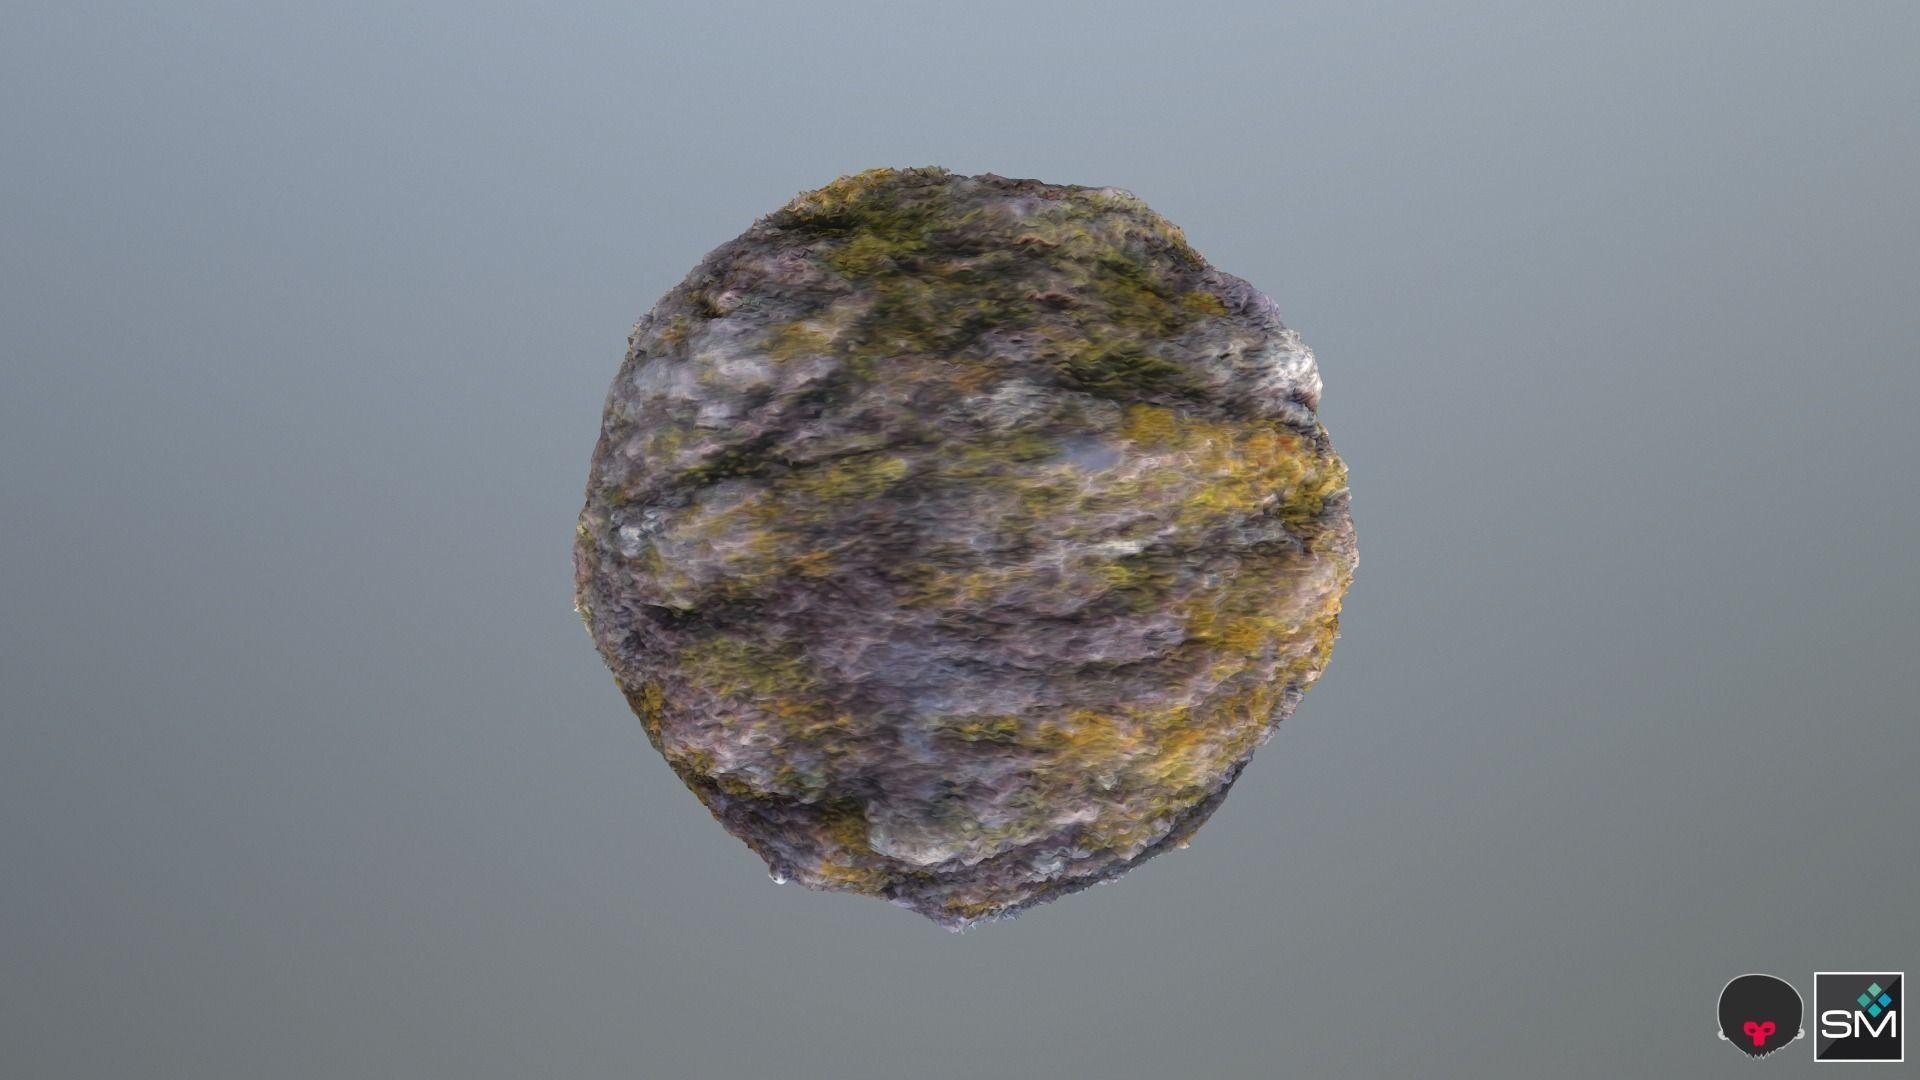 Mossy stone pbr